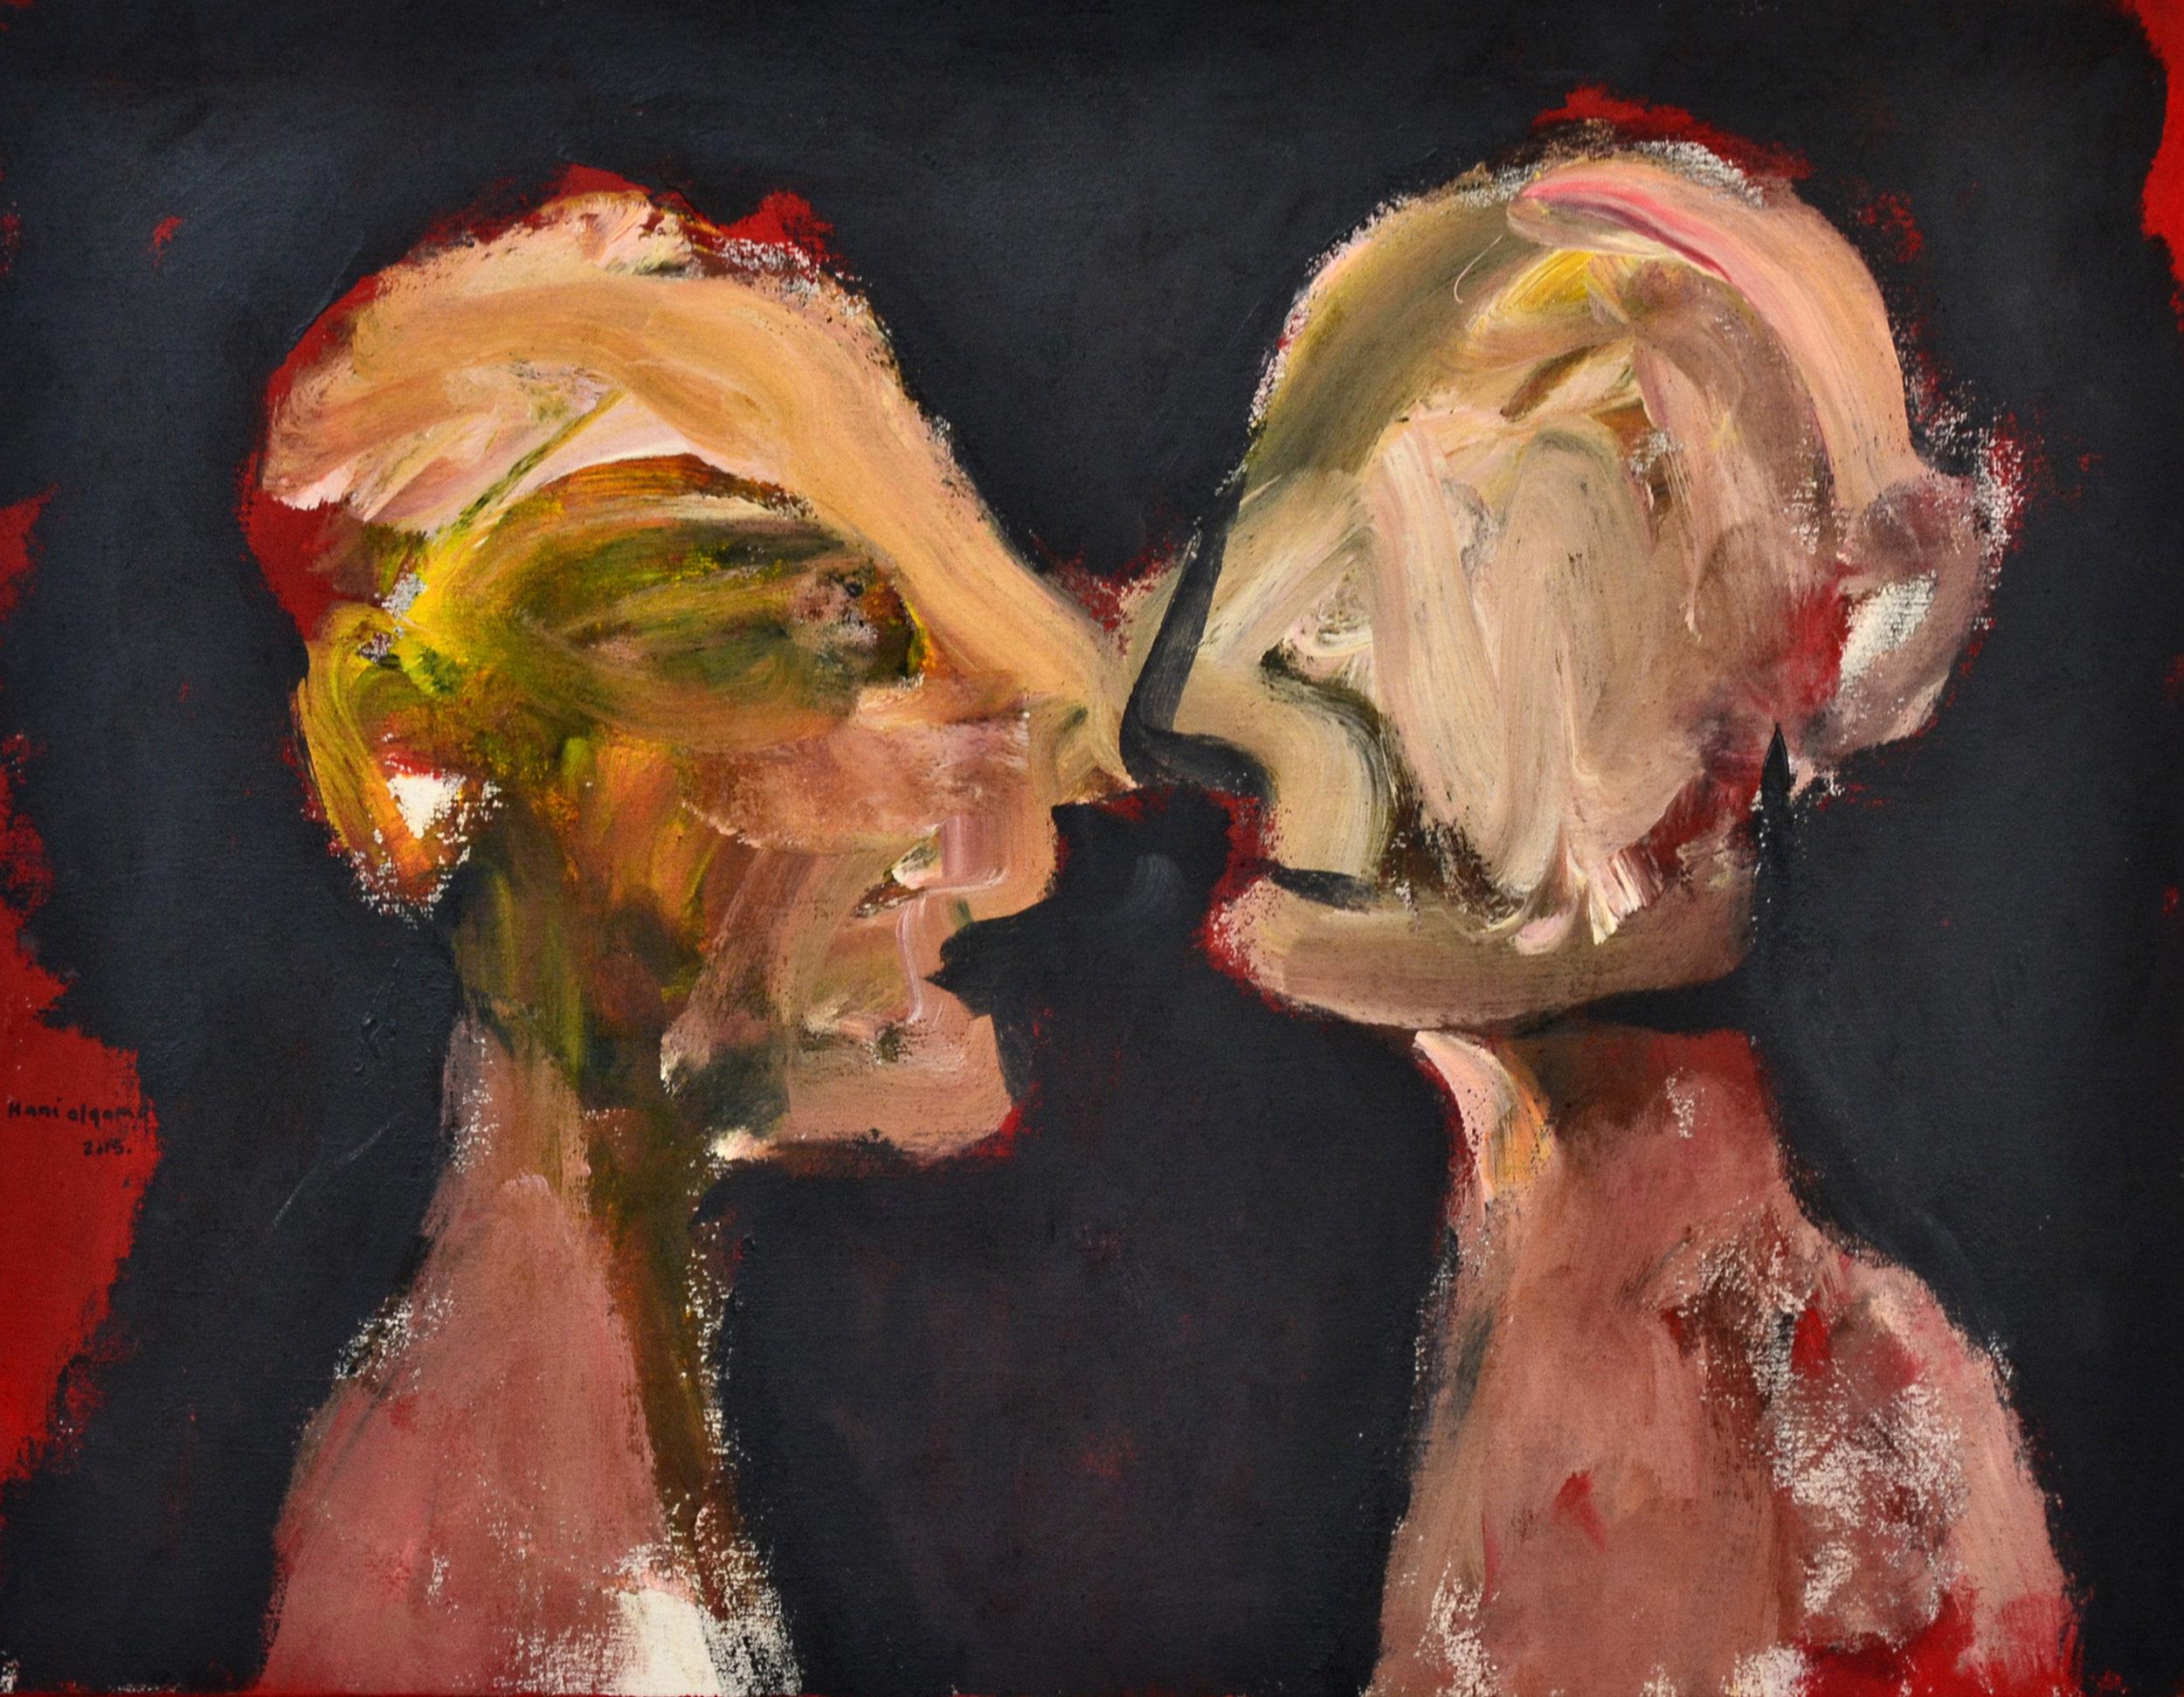 XOL Gallery - Hani Alqam (Jordan) - _Mutual Misunderstanding_ - 31 x 24 in - Acrylic on canvas - Baltimore, MD 2015 - $2,500 .jpg